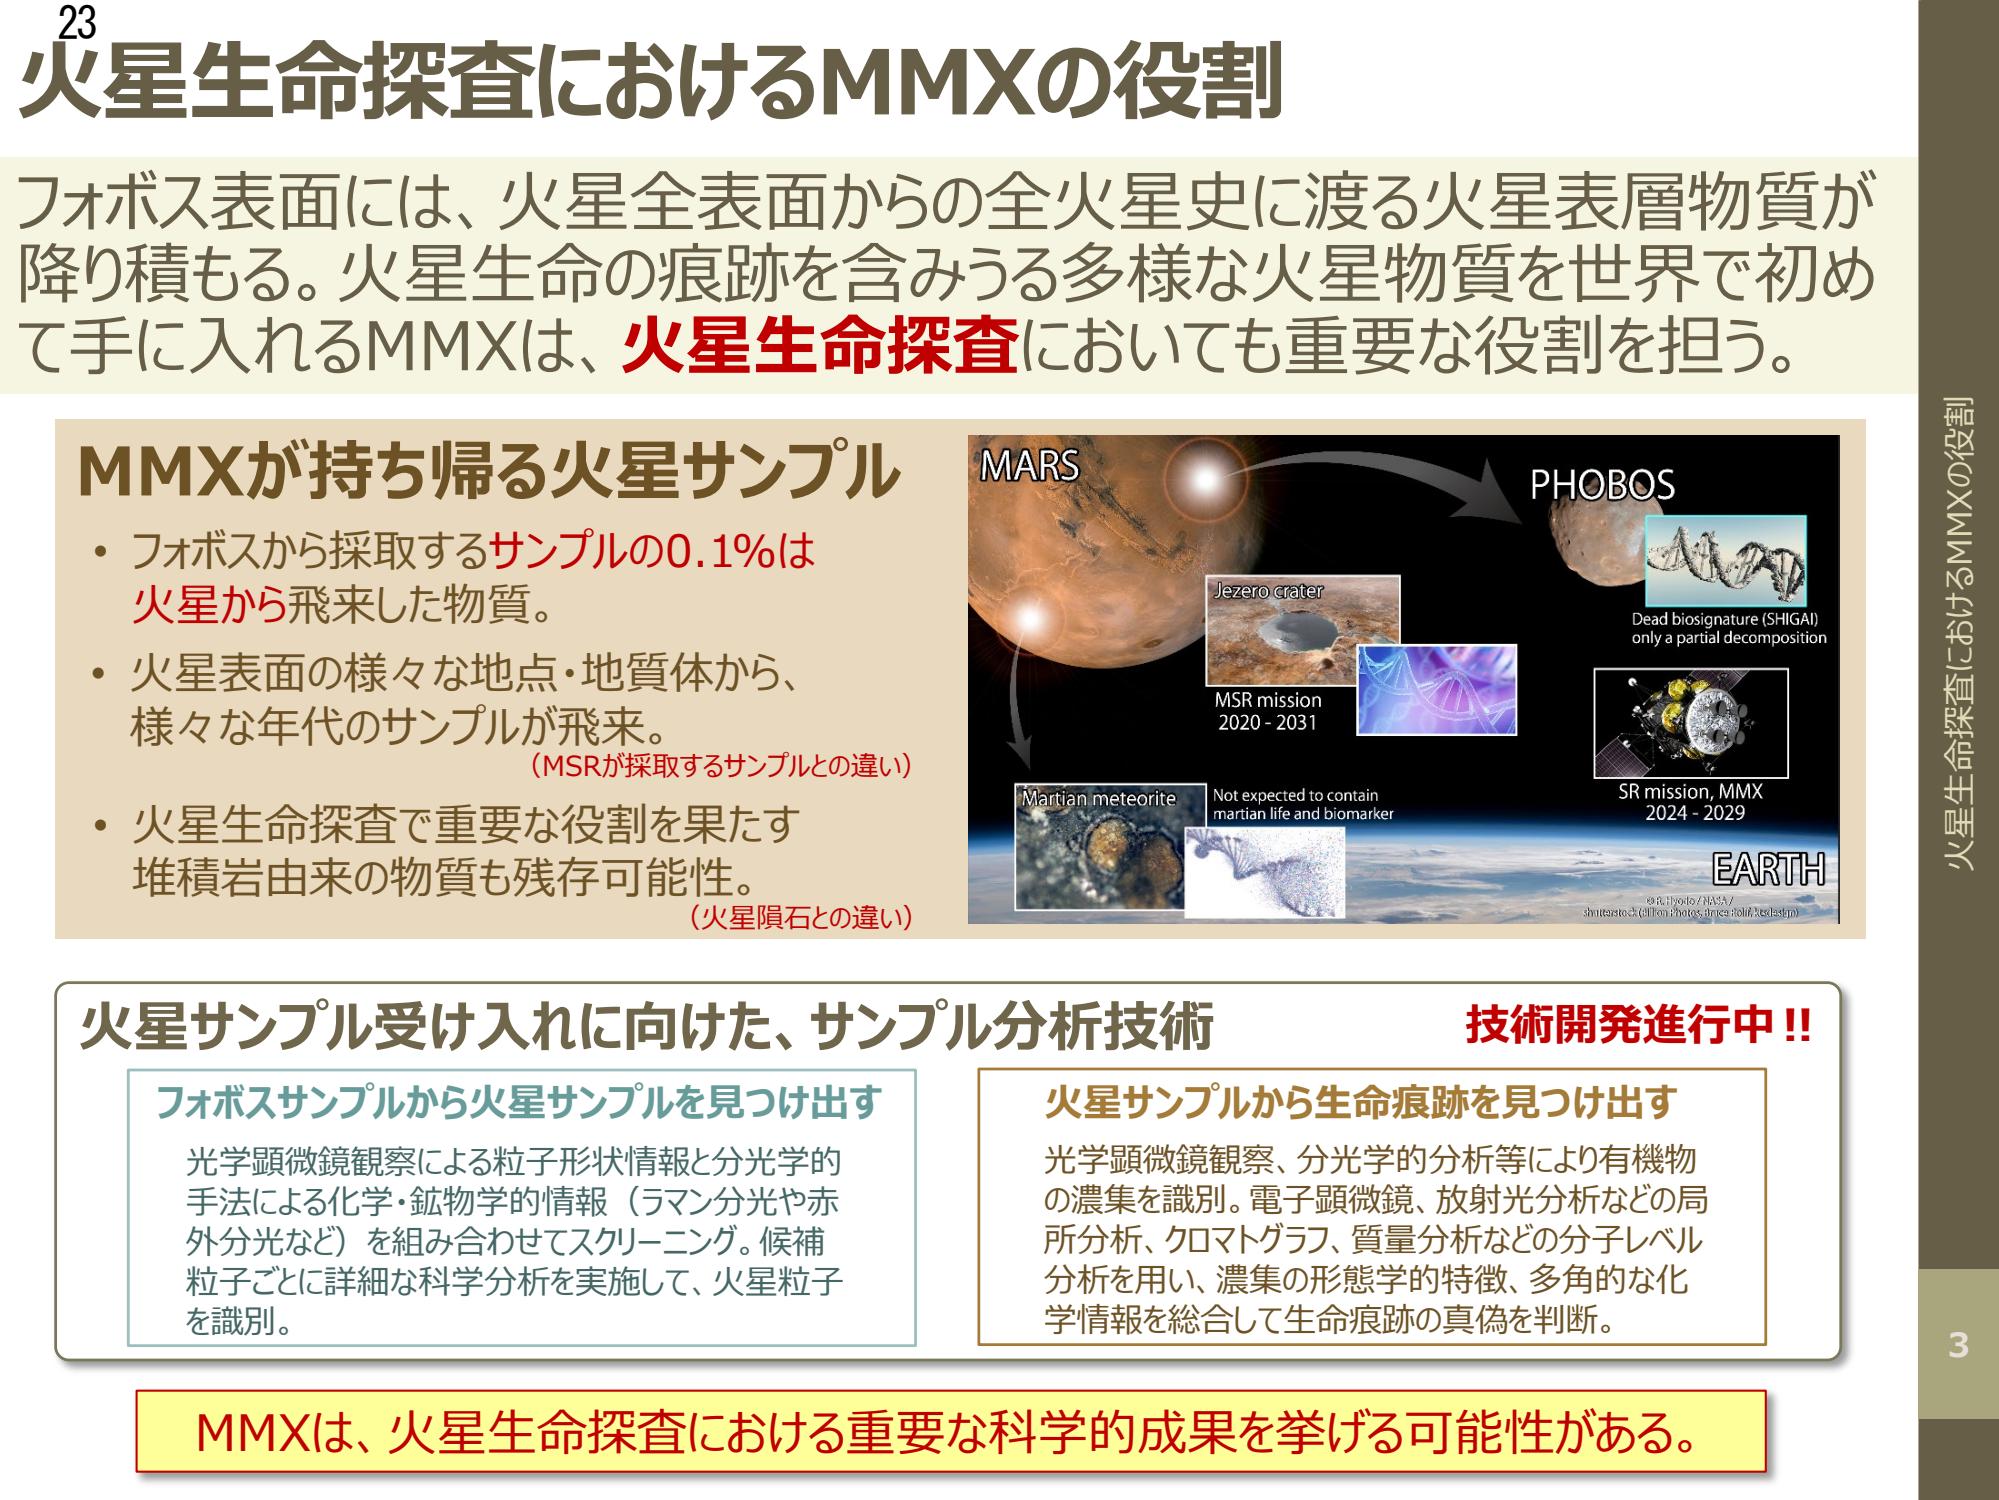 f:id:Imamura:20210819095701p:plain